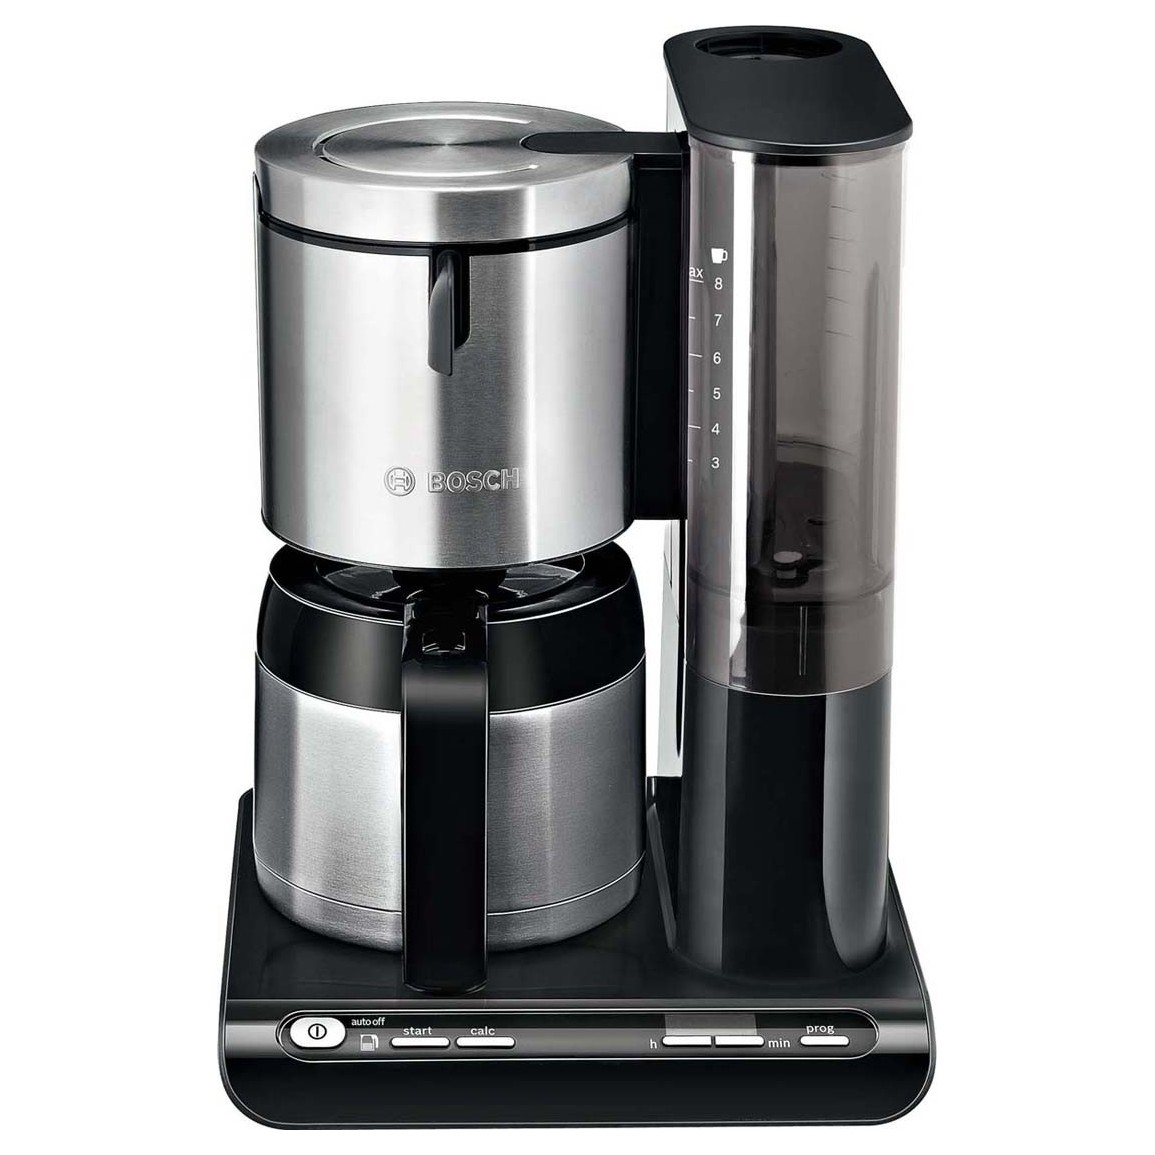 Bosch Kleingeräte+HT Thermo-Kaffeeautomat TKA8653 sw